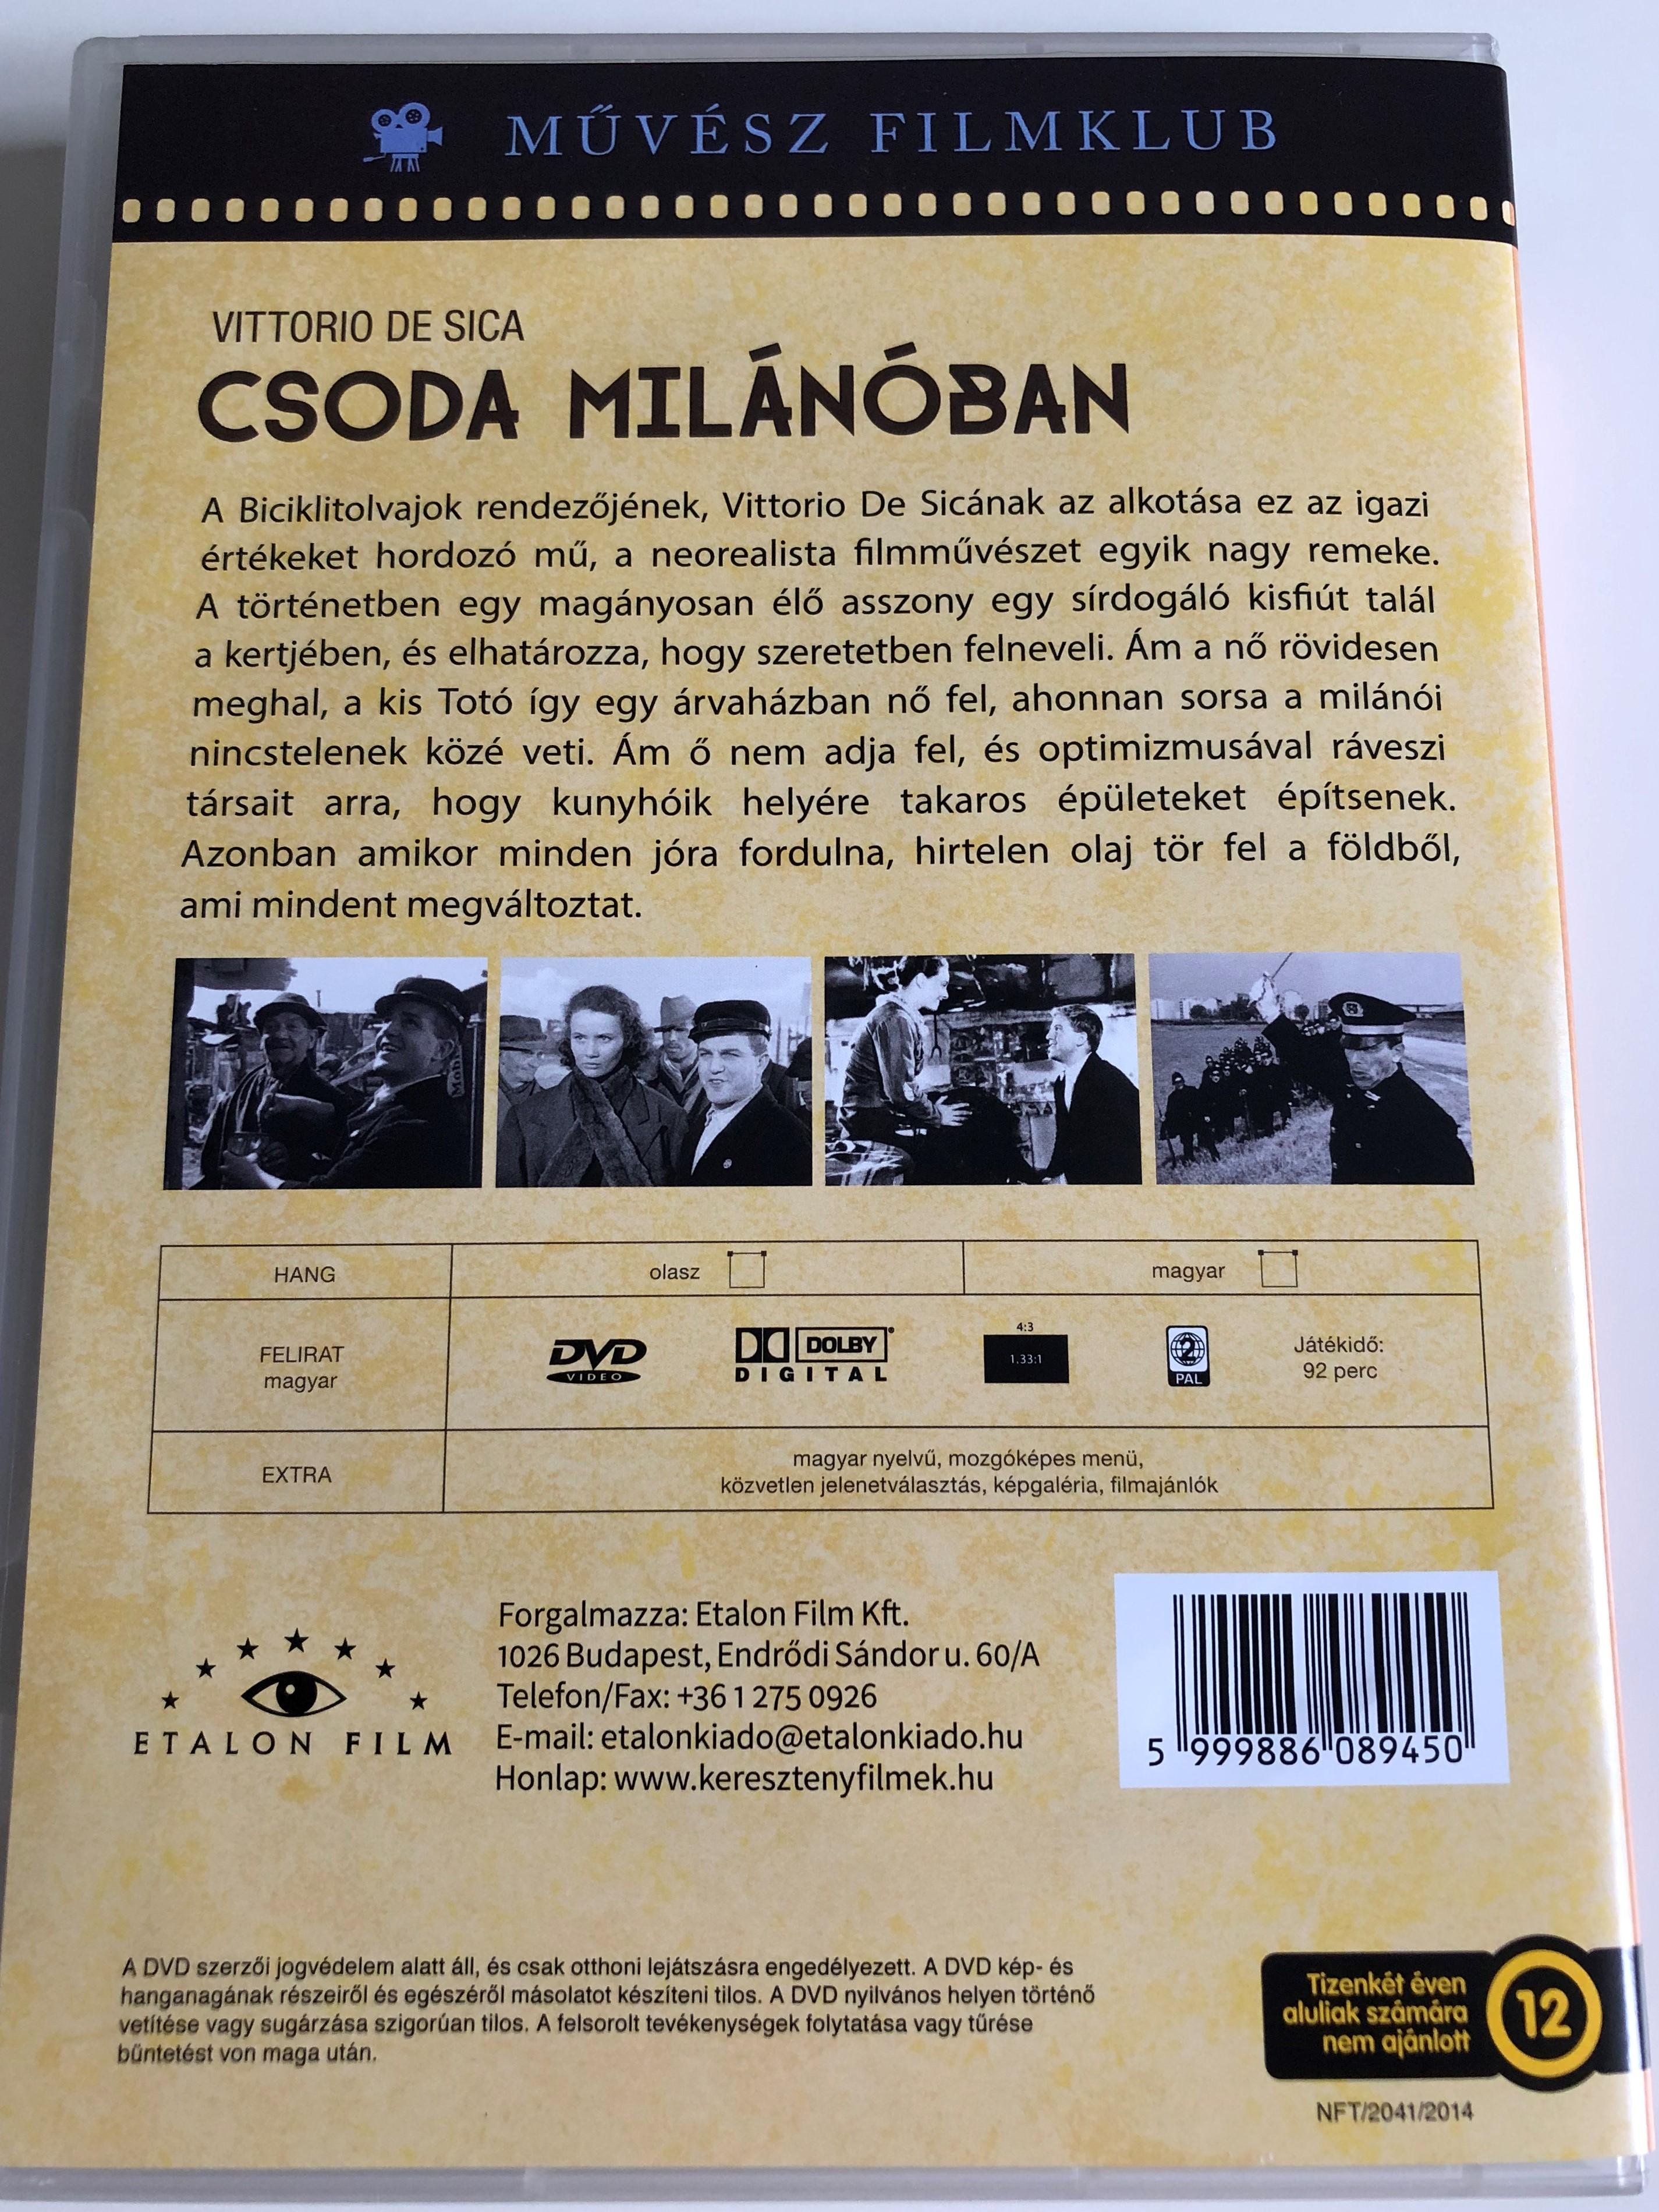 miracolo-a-milano-dvd-1951-csoda-mil-n-ban-miracle-in-milan-directed-by-vittorio-de-sica-starring-emma-gramatica-francesco-golisano-3-.jpg